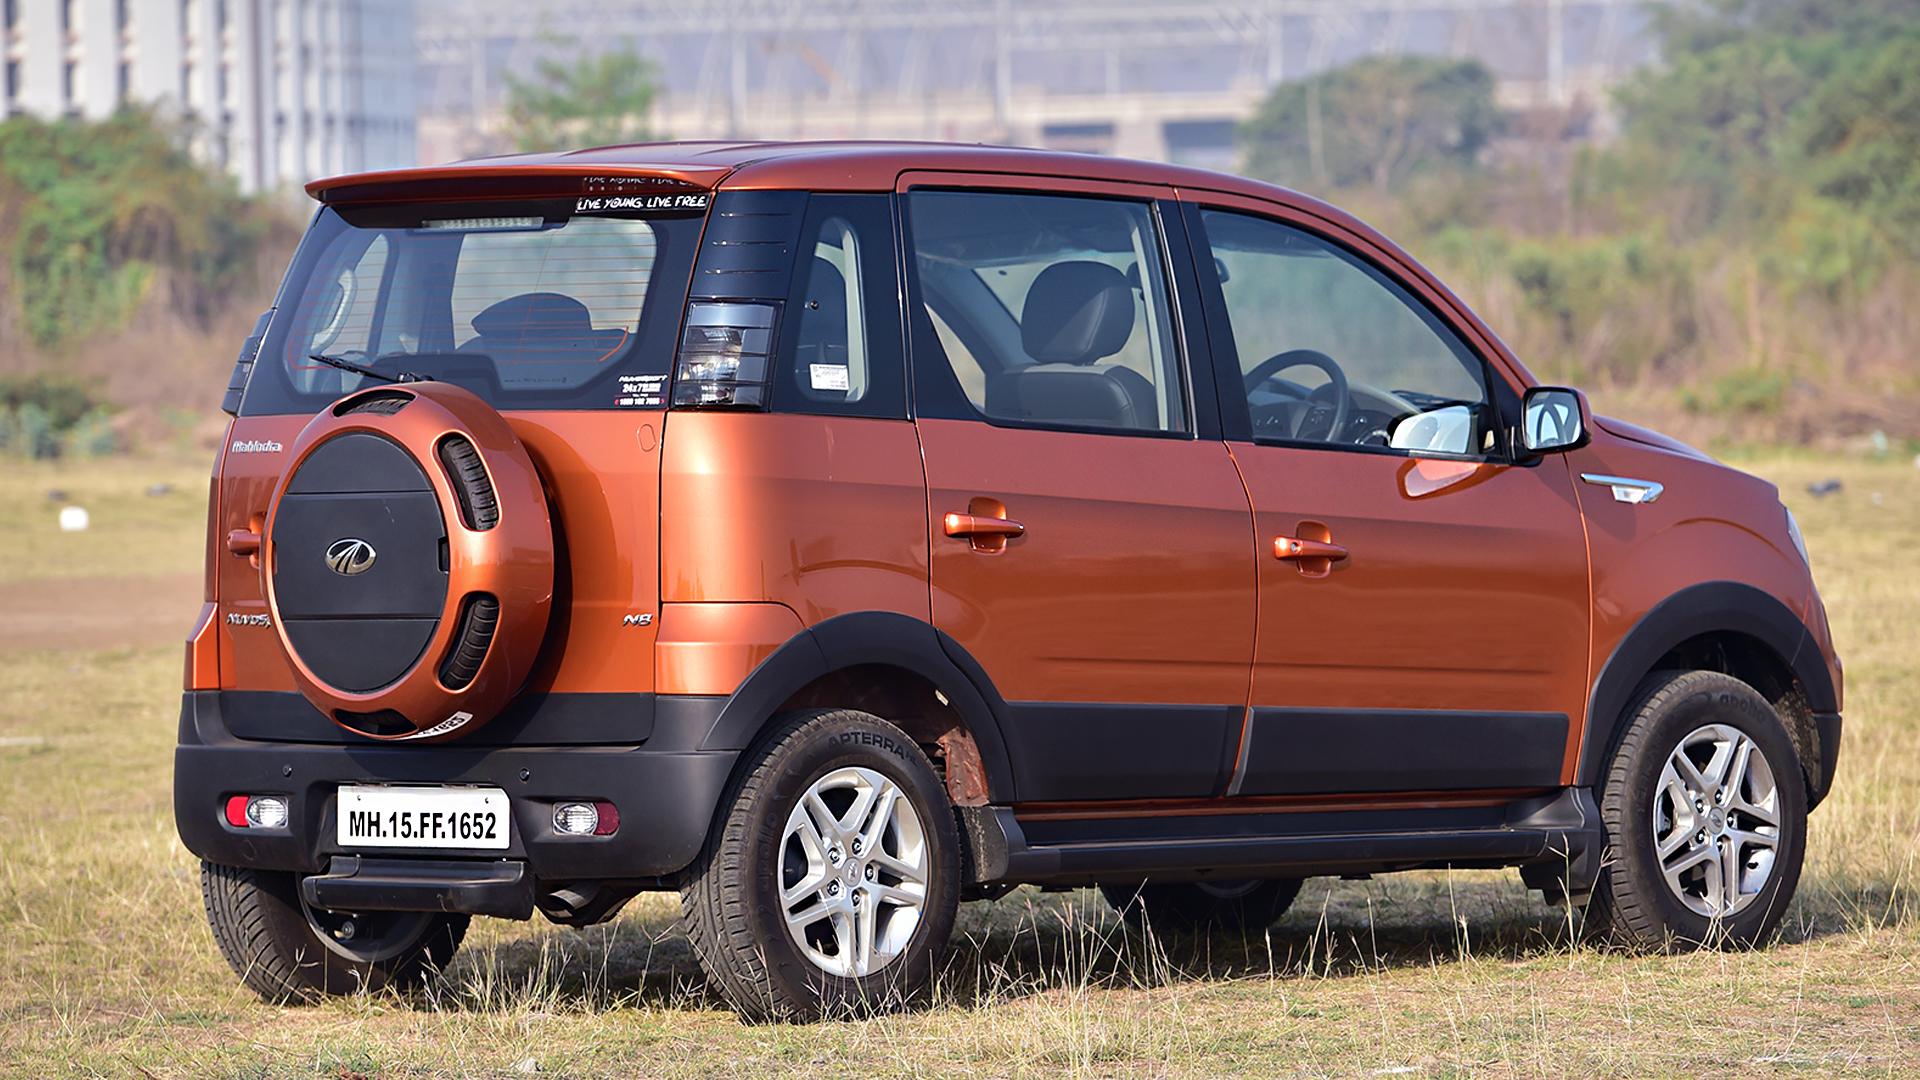 Mahindra Nuvosport 2016 N8 Compare